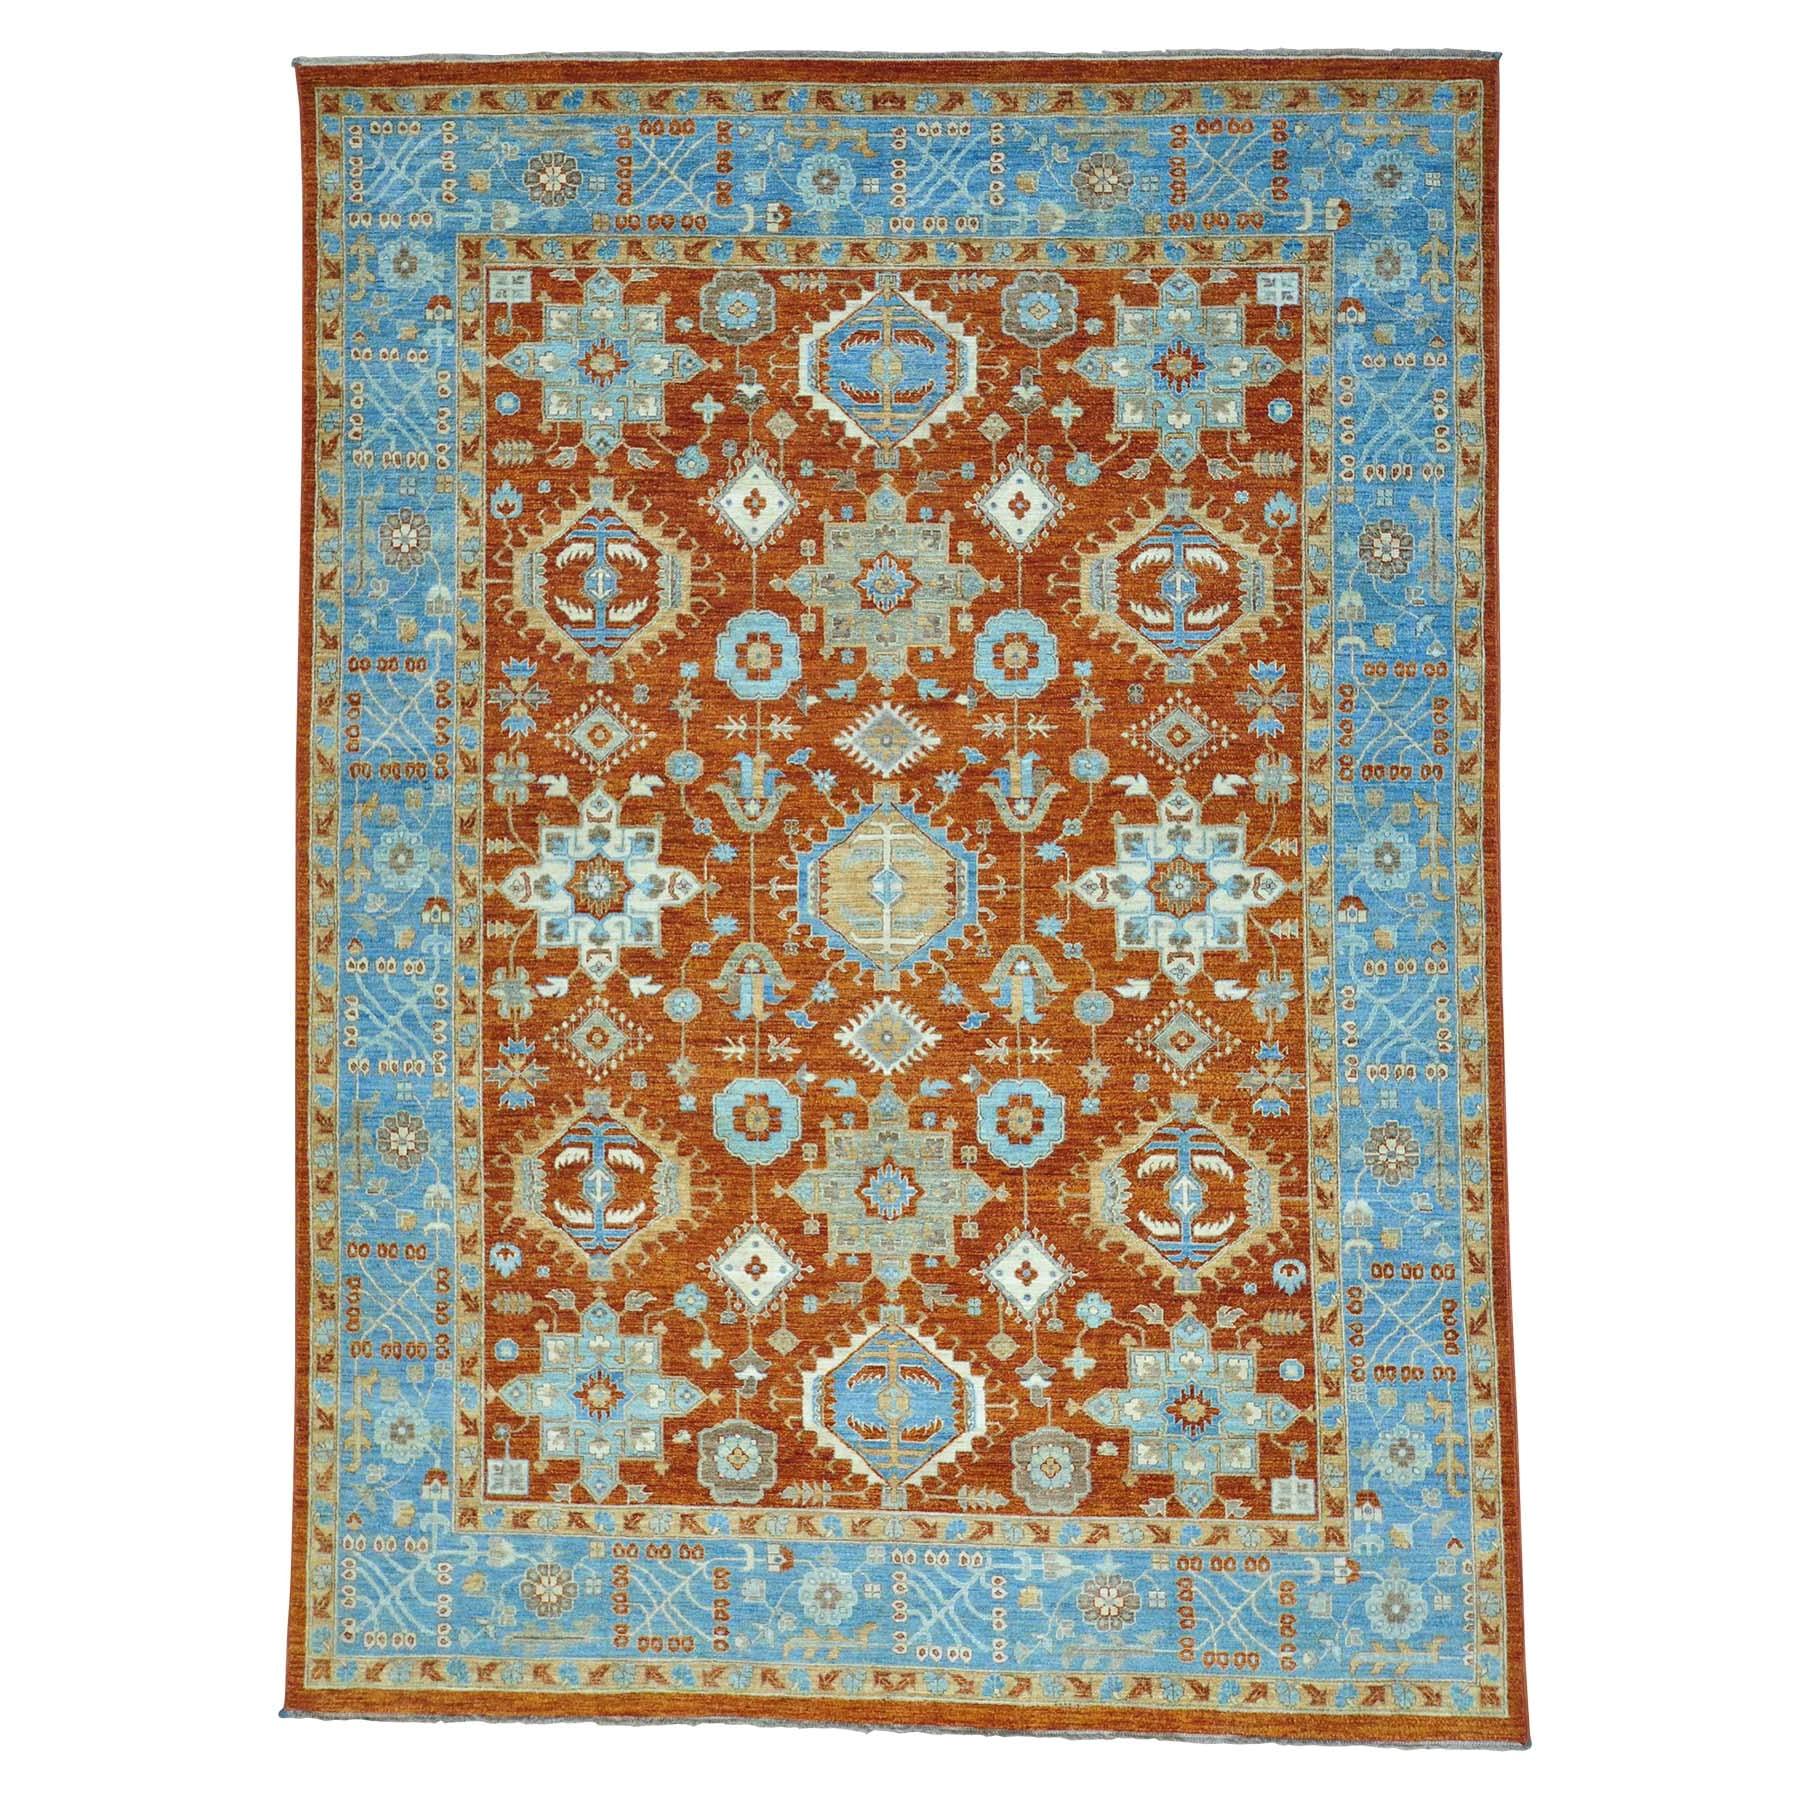 9 x12 2 peshawar with karajeh design pure wool handmade oriental rug sh27757